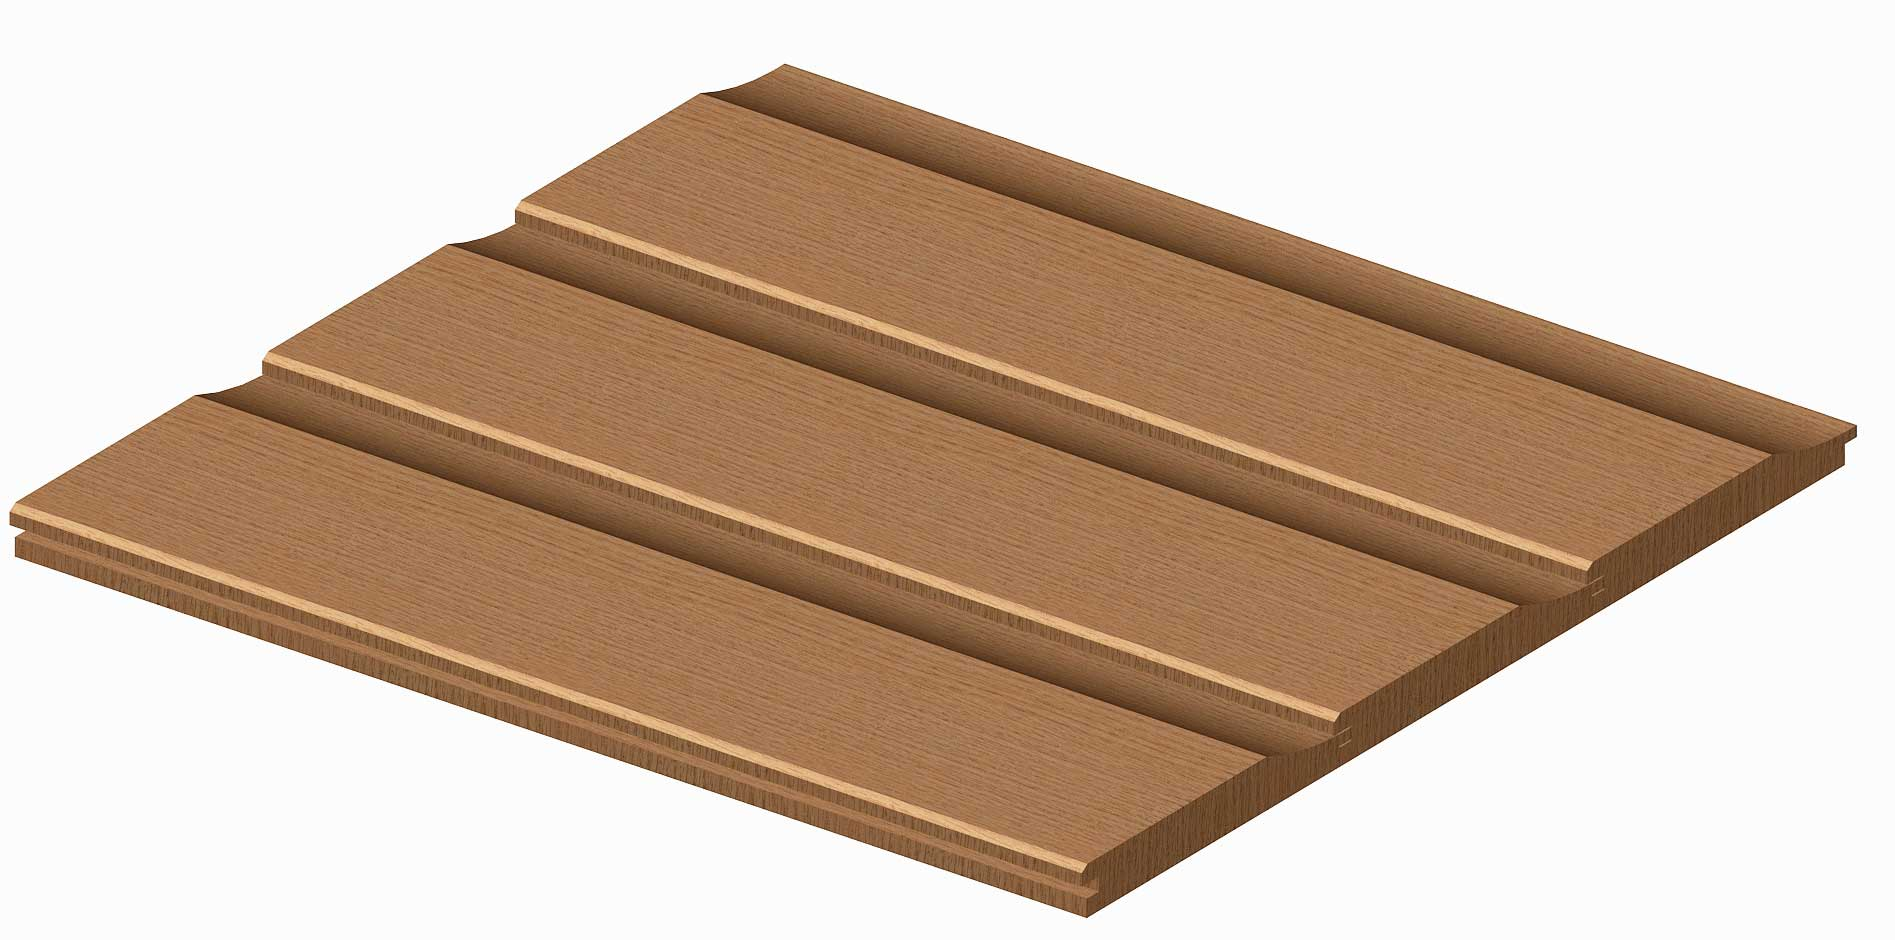 Shiplap timber cedar cladding shiplap cladding cl106 - Exterior cladding cost comparison ...